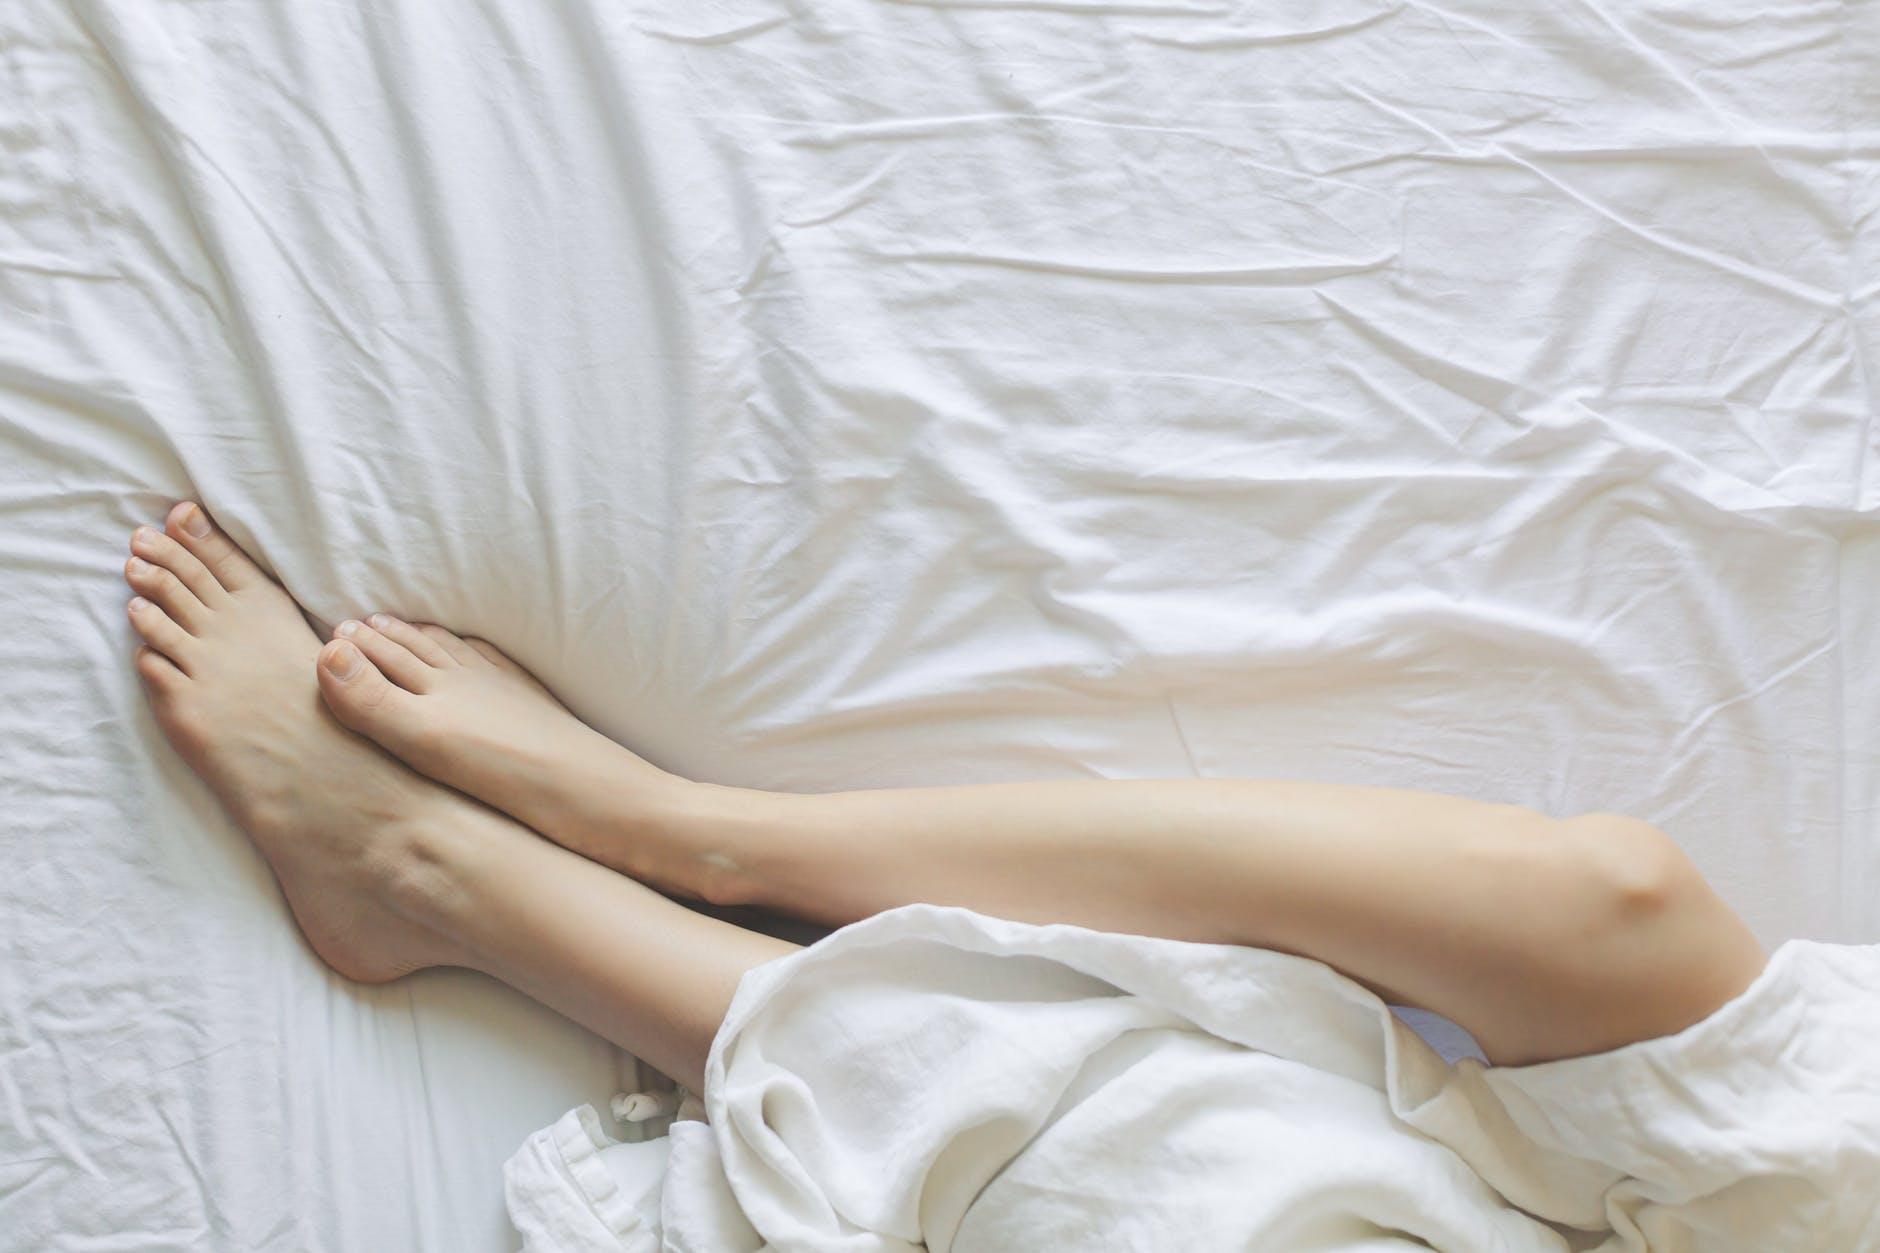 3 Simple Ways To Tackle Winter Fatigue